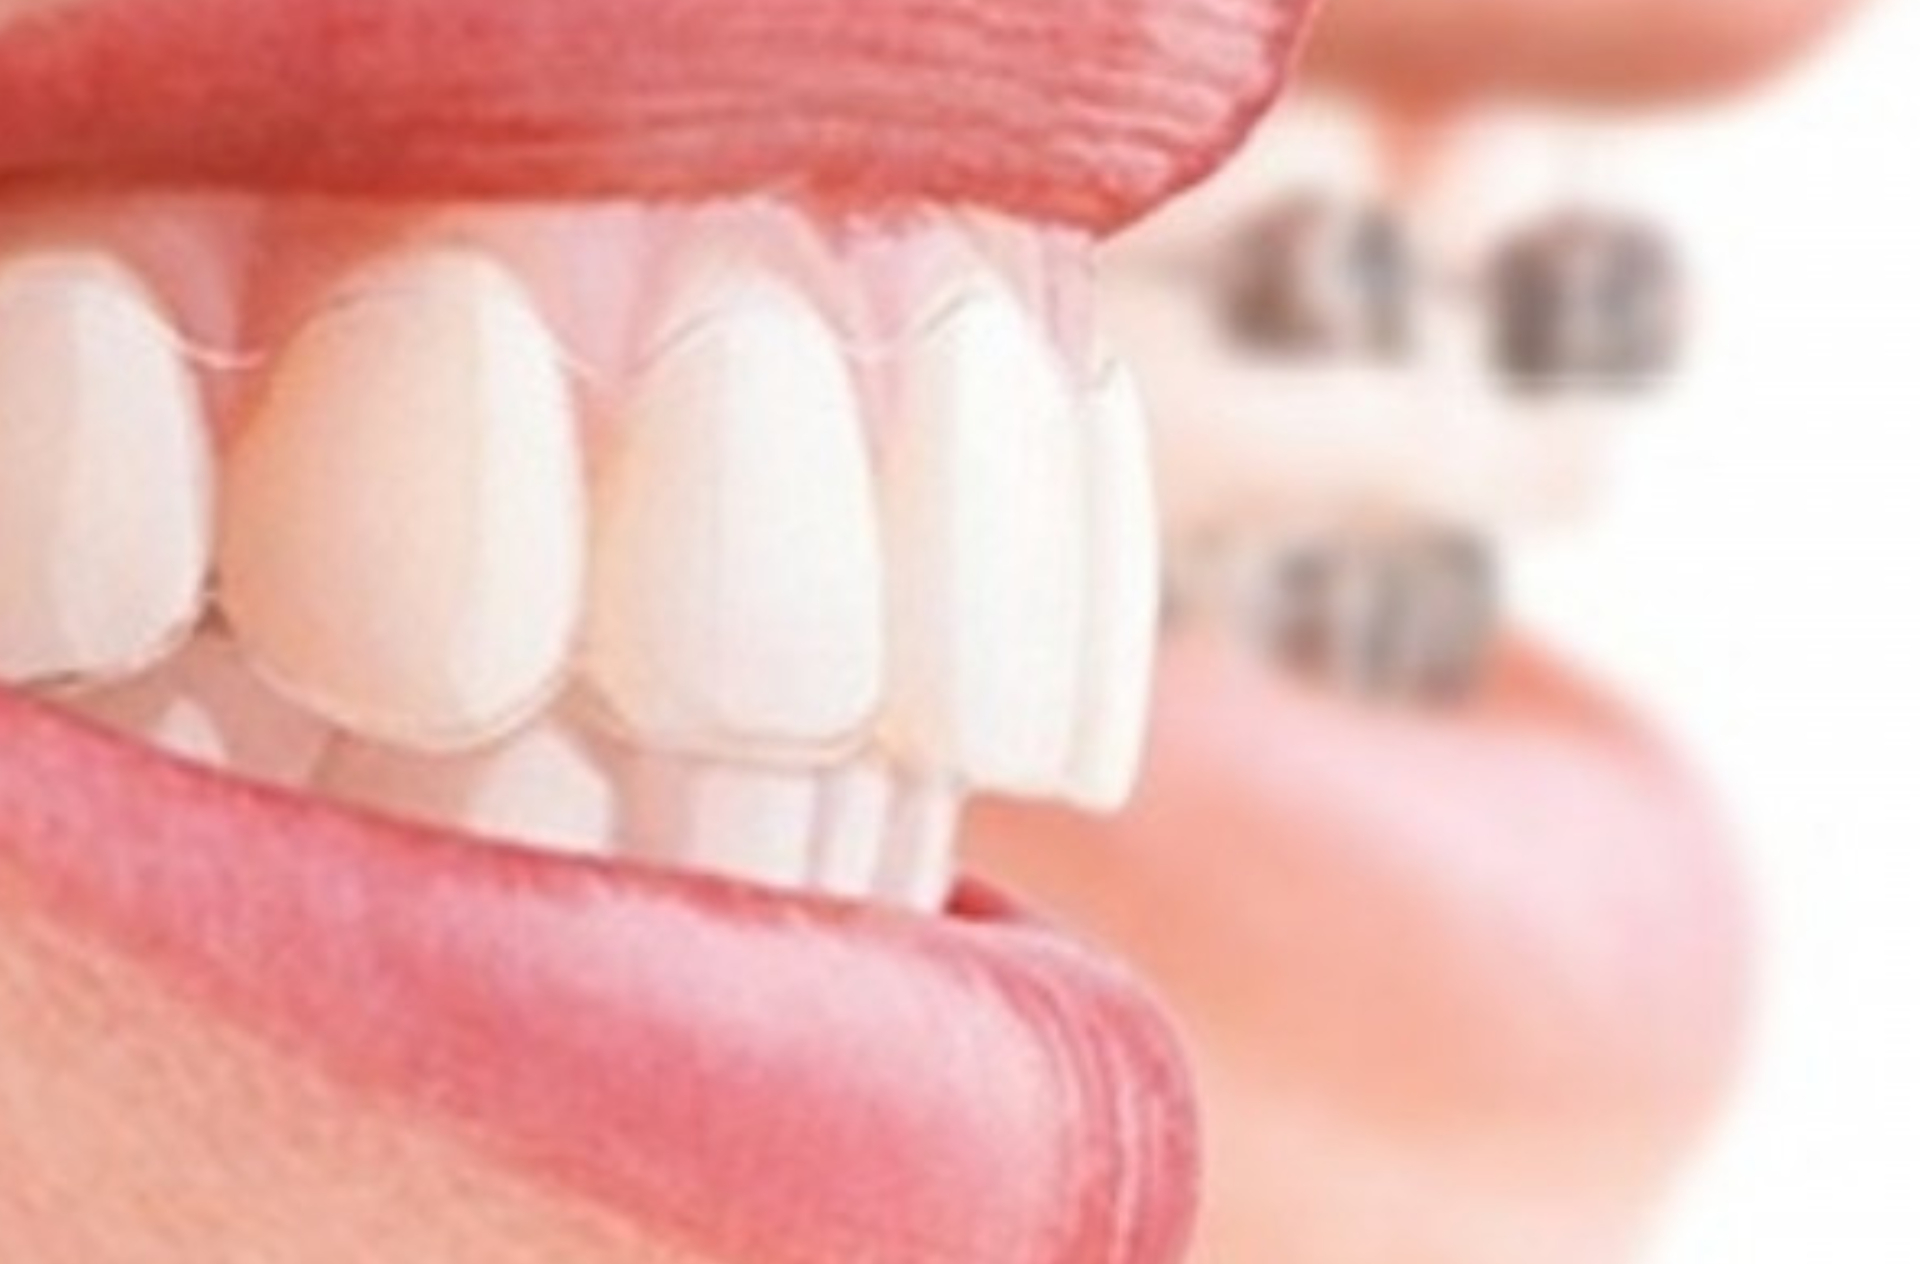 Invisaligne i7 orthodontic appliance